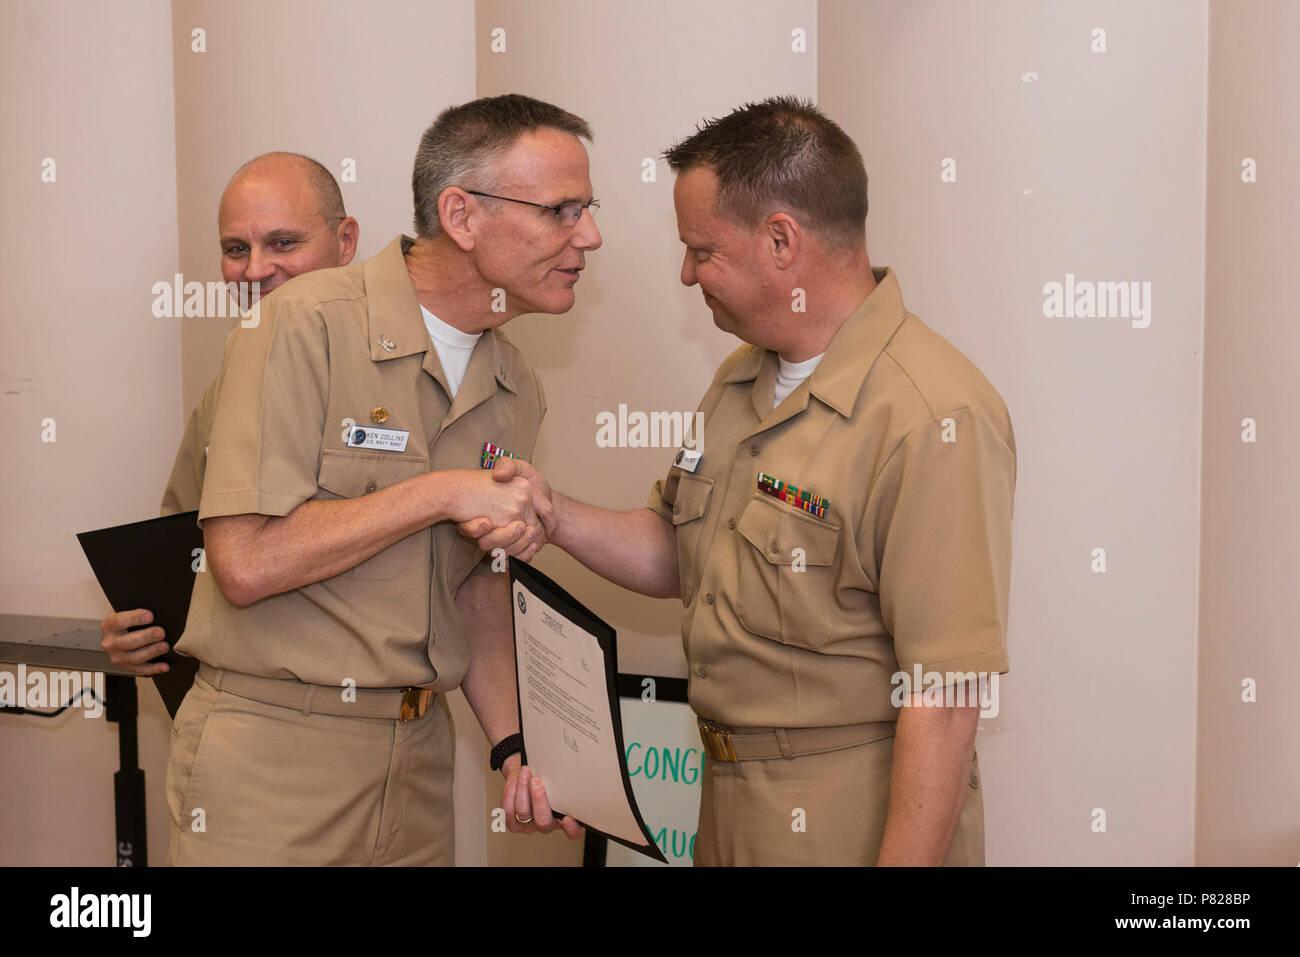 Us Army Air Force Captain Stockfotos & Us Army Air Force Captain ...